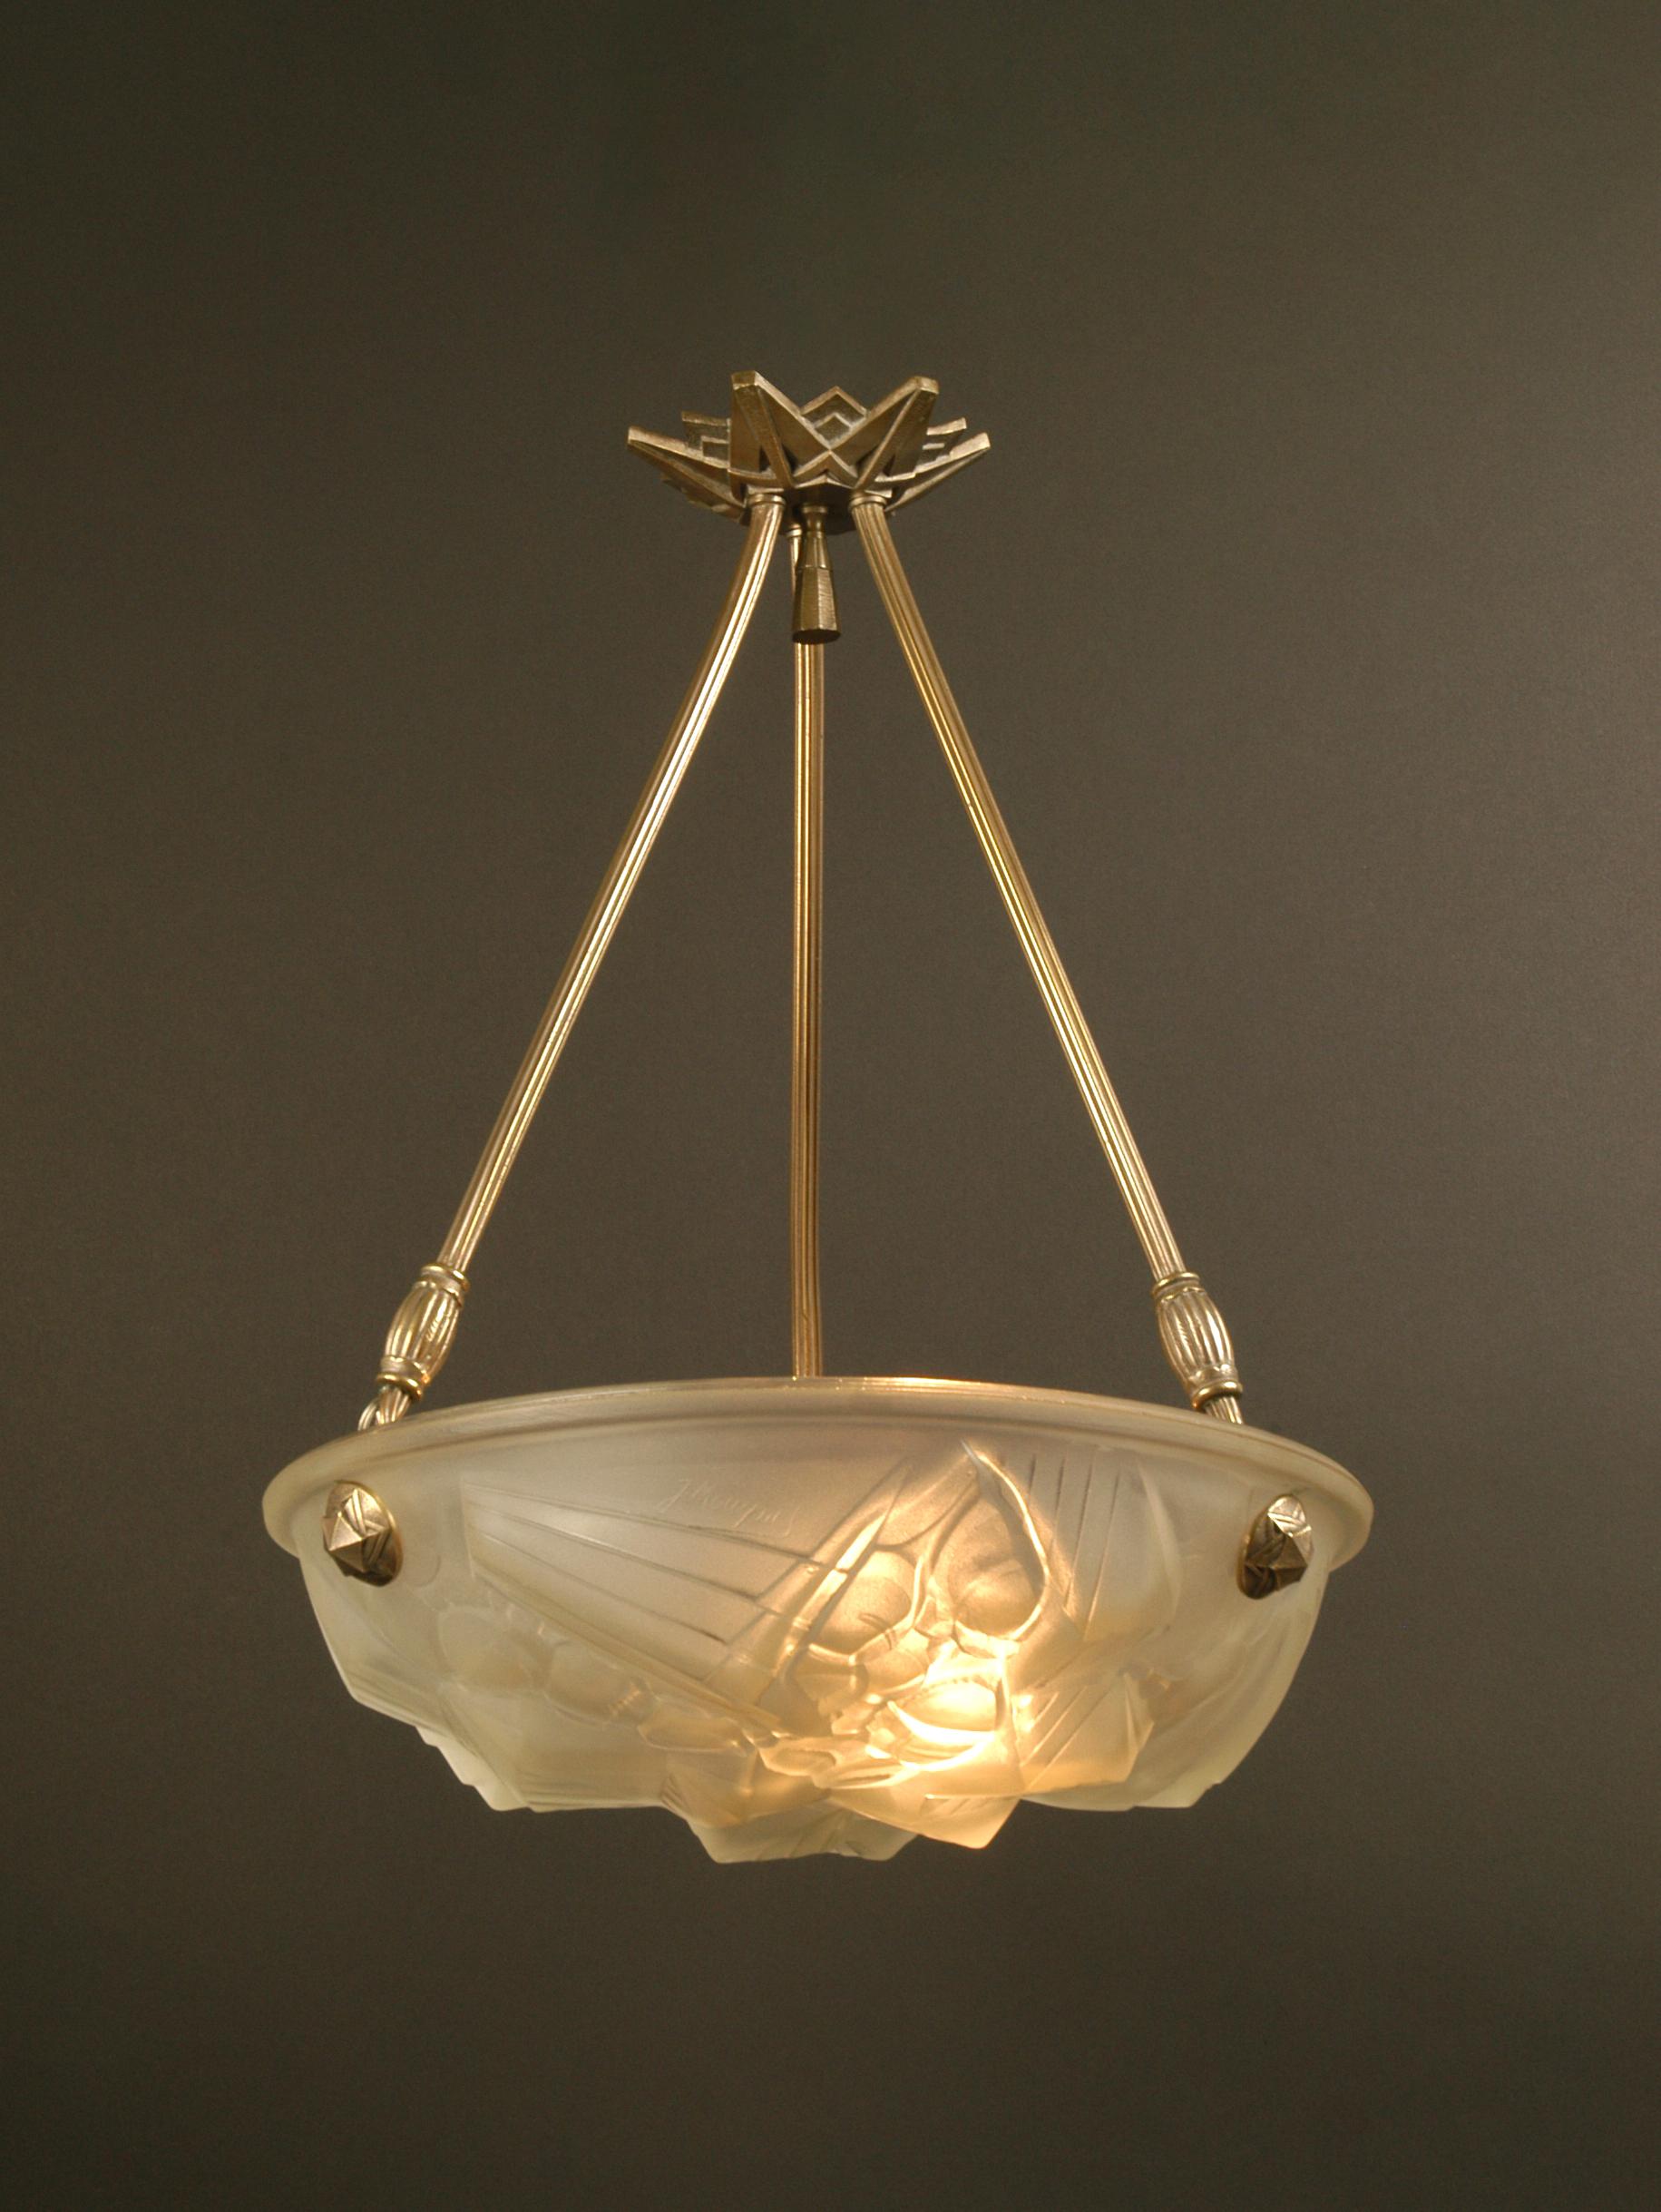 Glass bowl ceiling fixture art deco henri mouynet